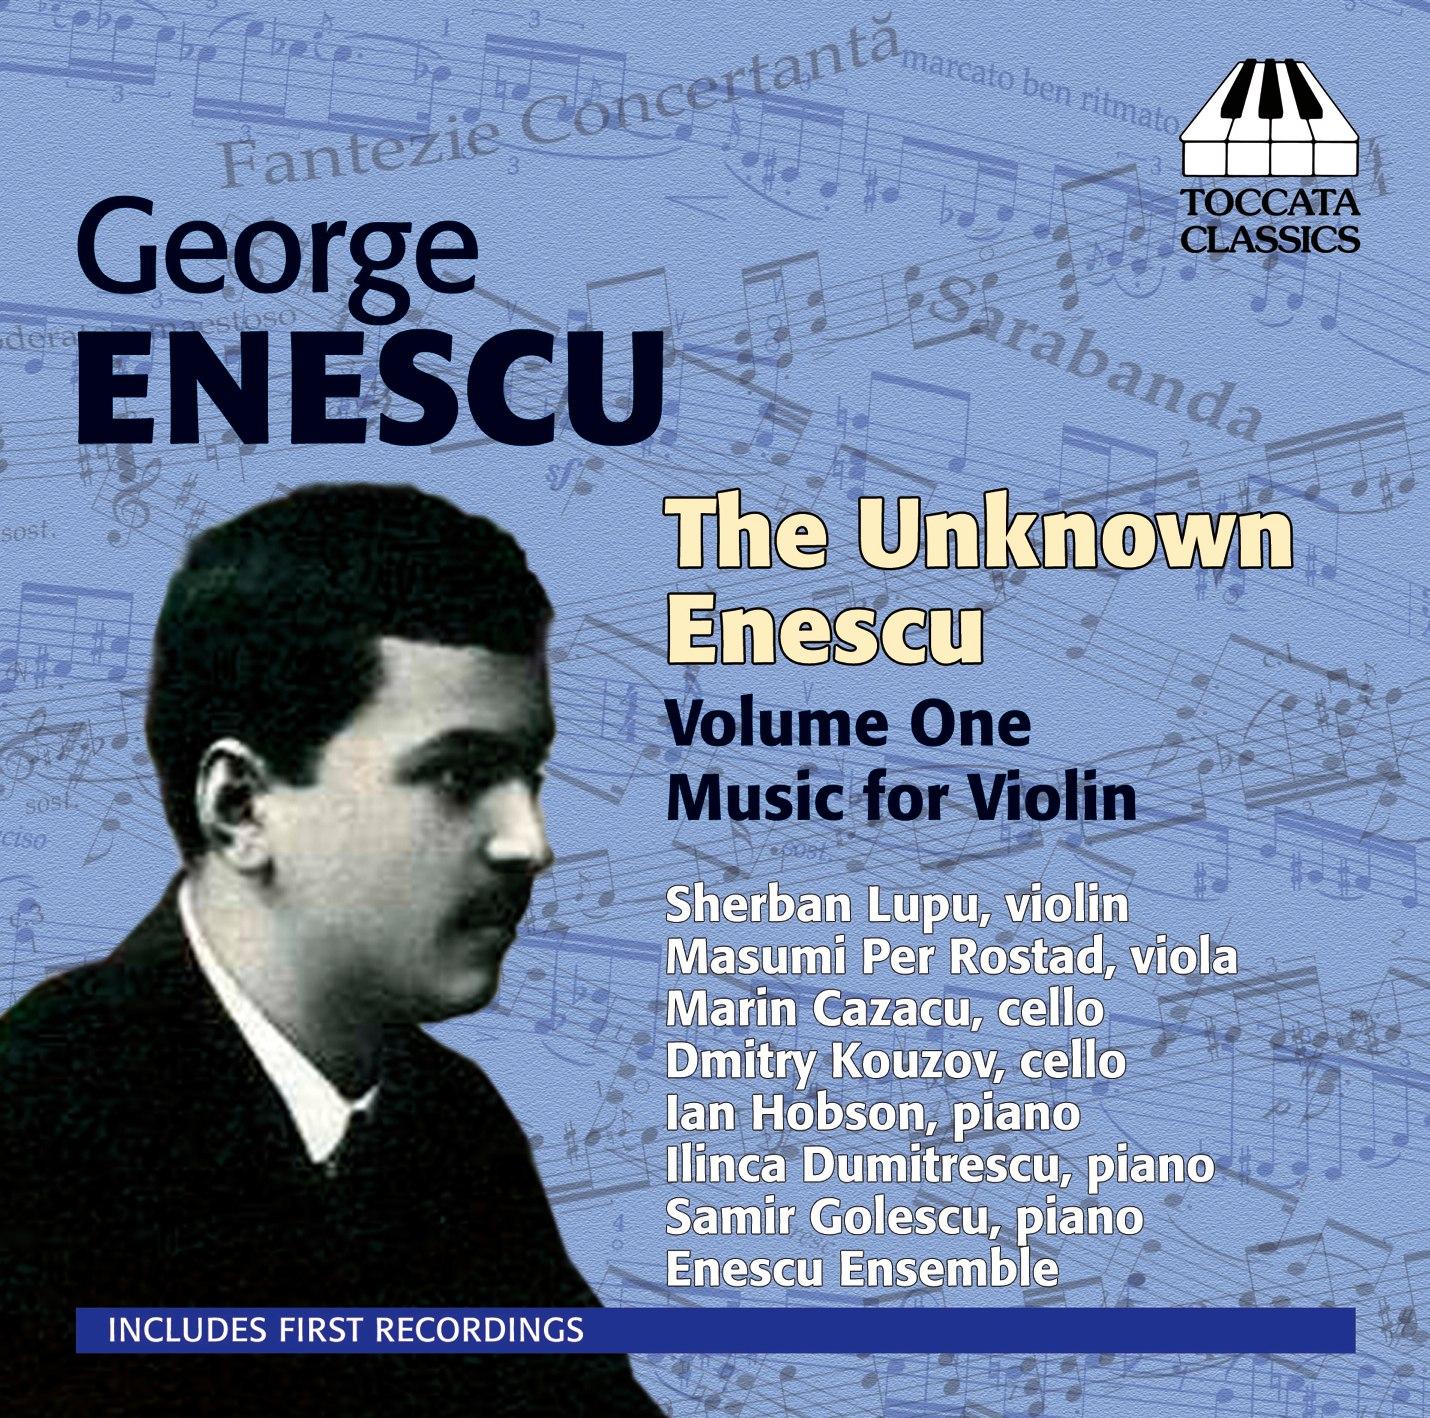 The Unknown Enescu